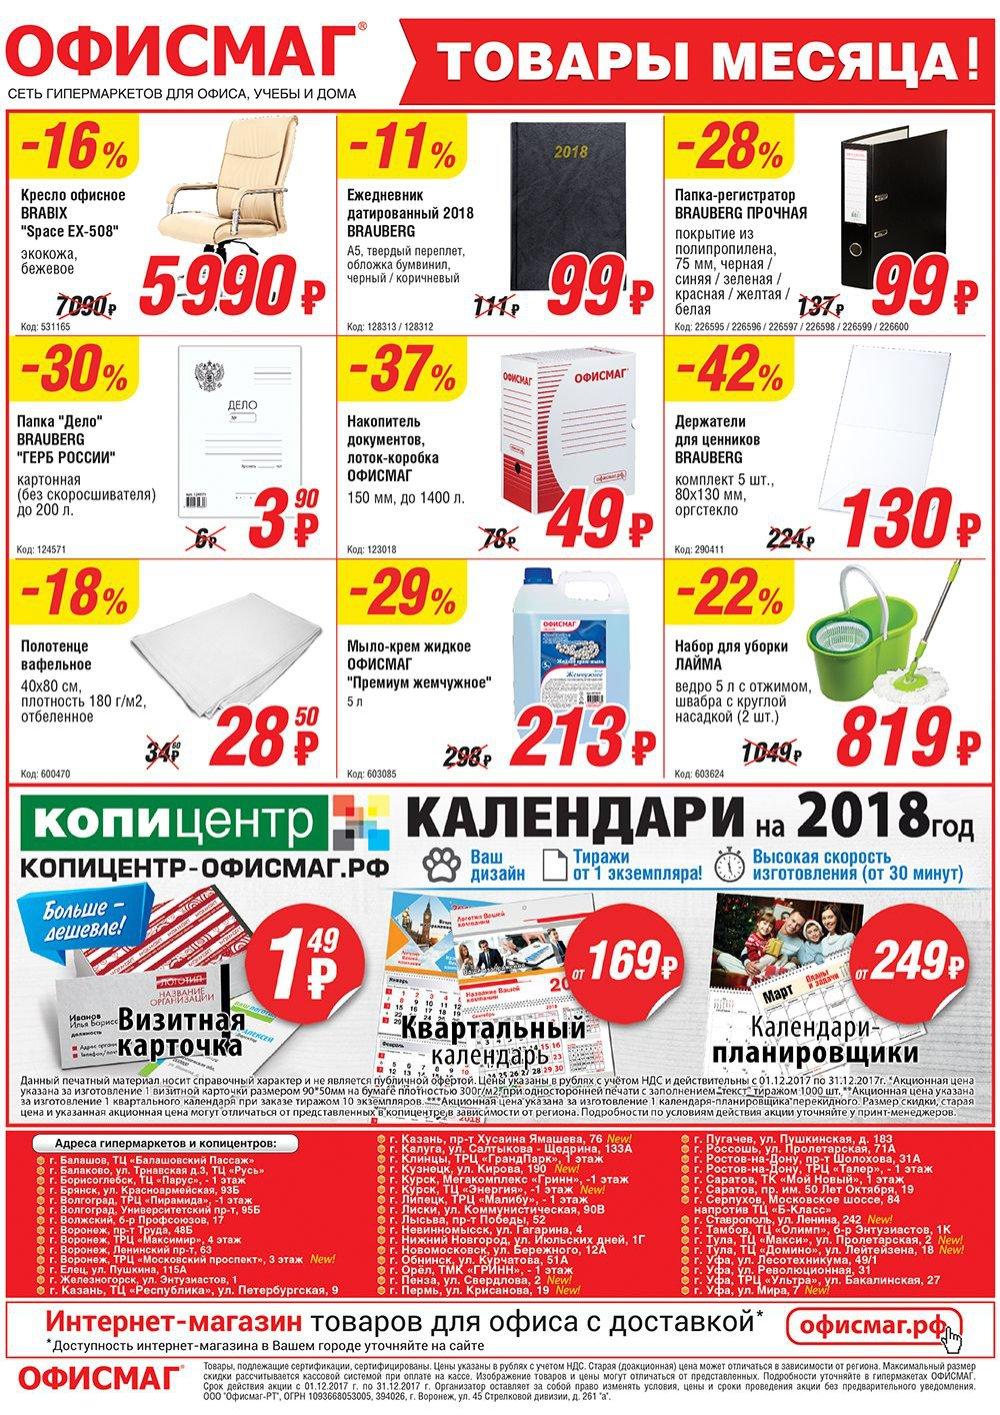 Каталог акций Офисмаг с 1 по 31 декабря 2017 - стр. 2